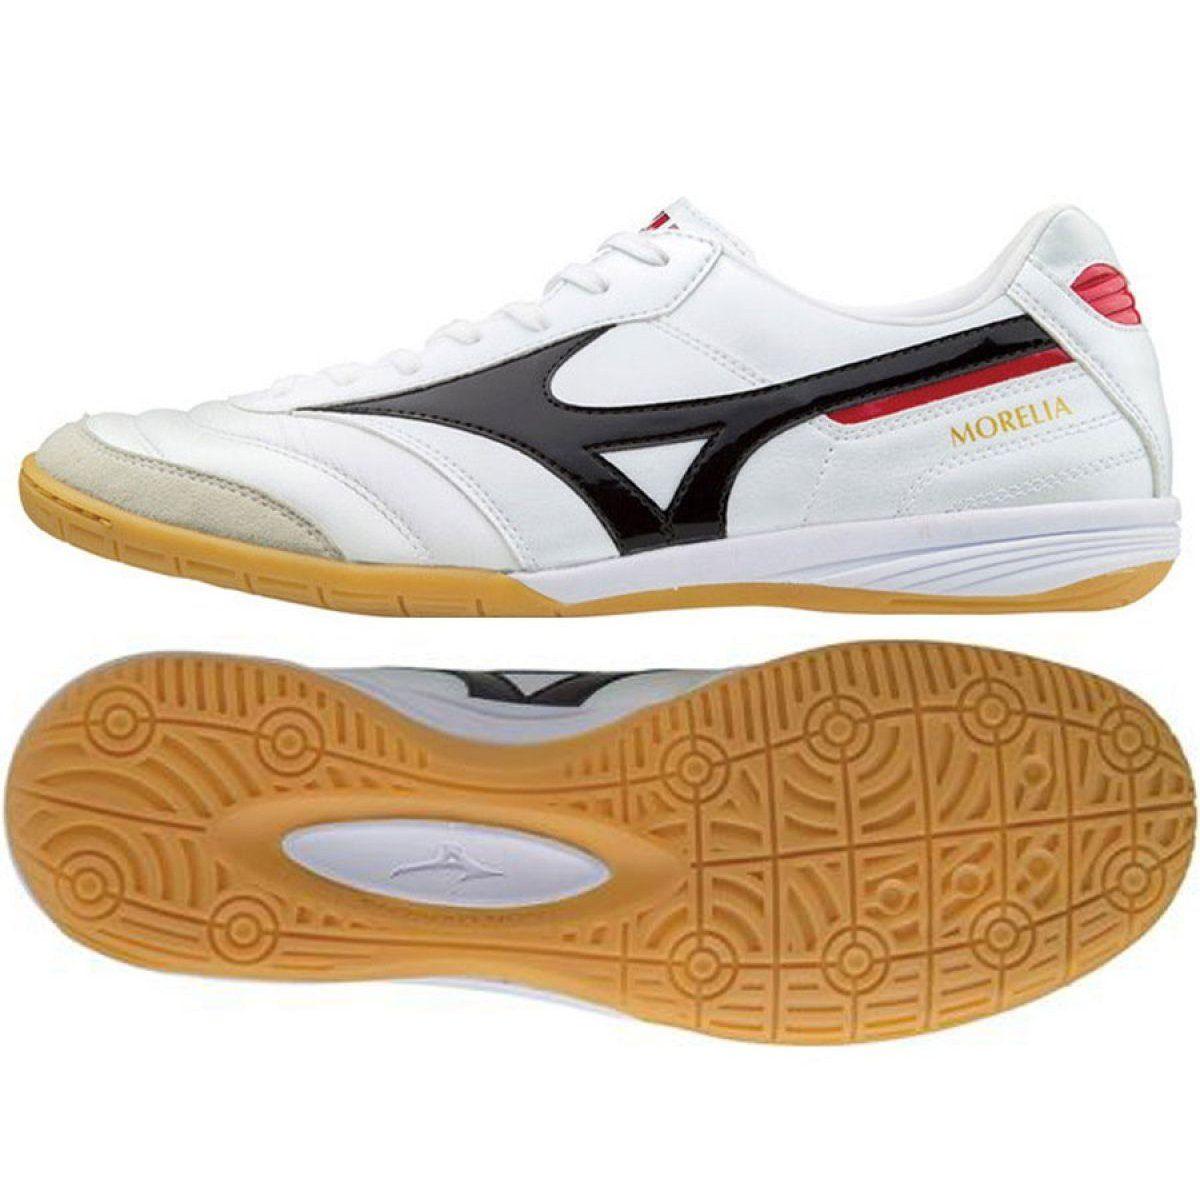 Buty Halowe Mizuno Morelia In M Q1ga170009 Biale Biale Indoor Shoe Mens Football Boots Football Boots